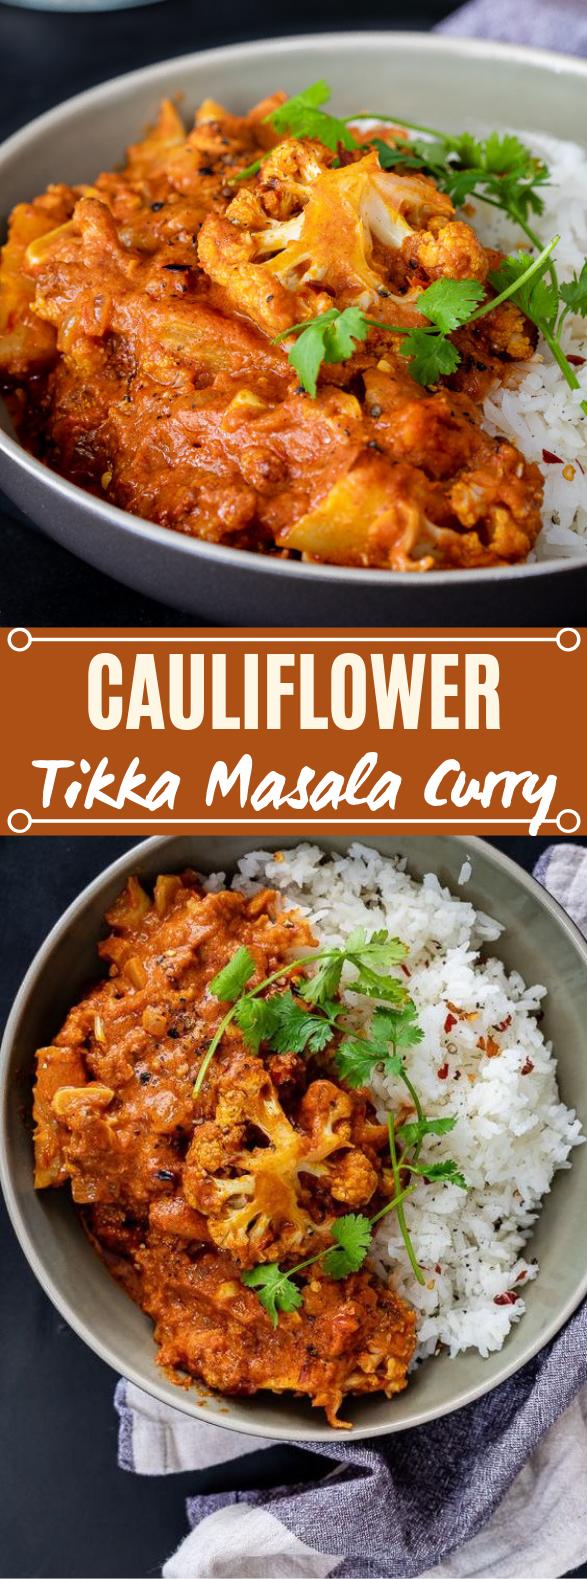 CAULIFLOWER TIKKA MASALA CURRY #vegetarian #curry